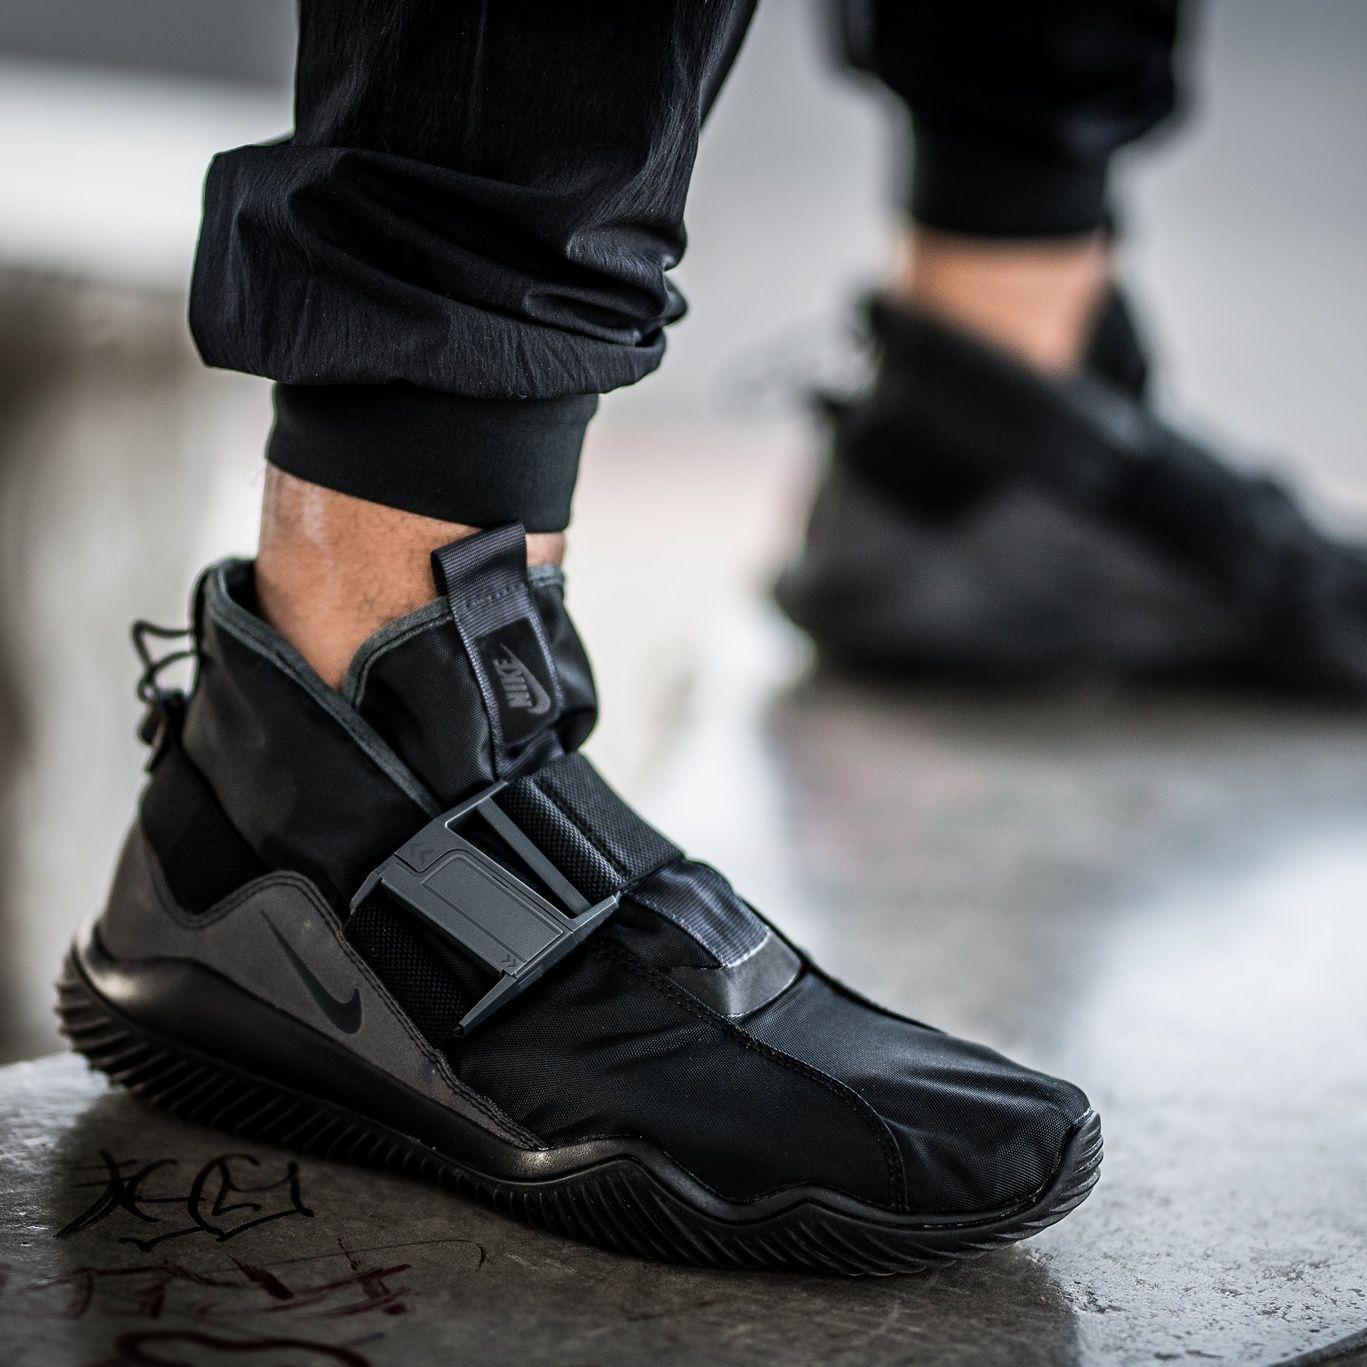 Futuristic shoes, Sneakers men fashion